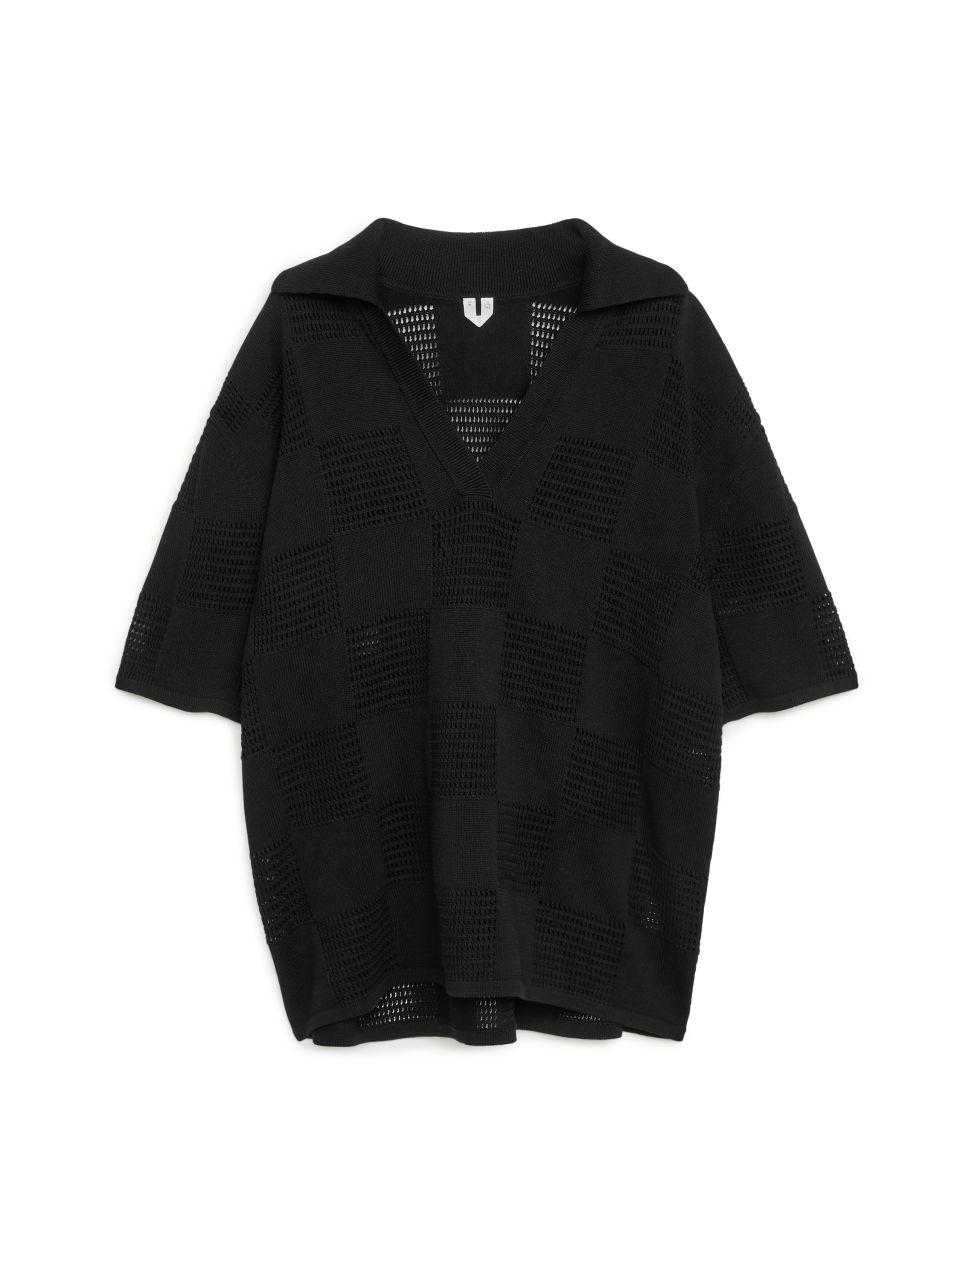 Fine Knit Cotton Tunic - Black